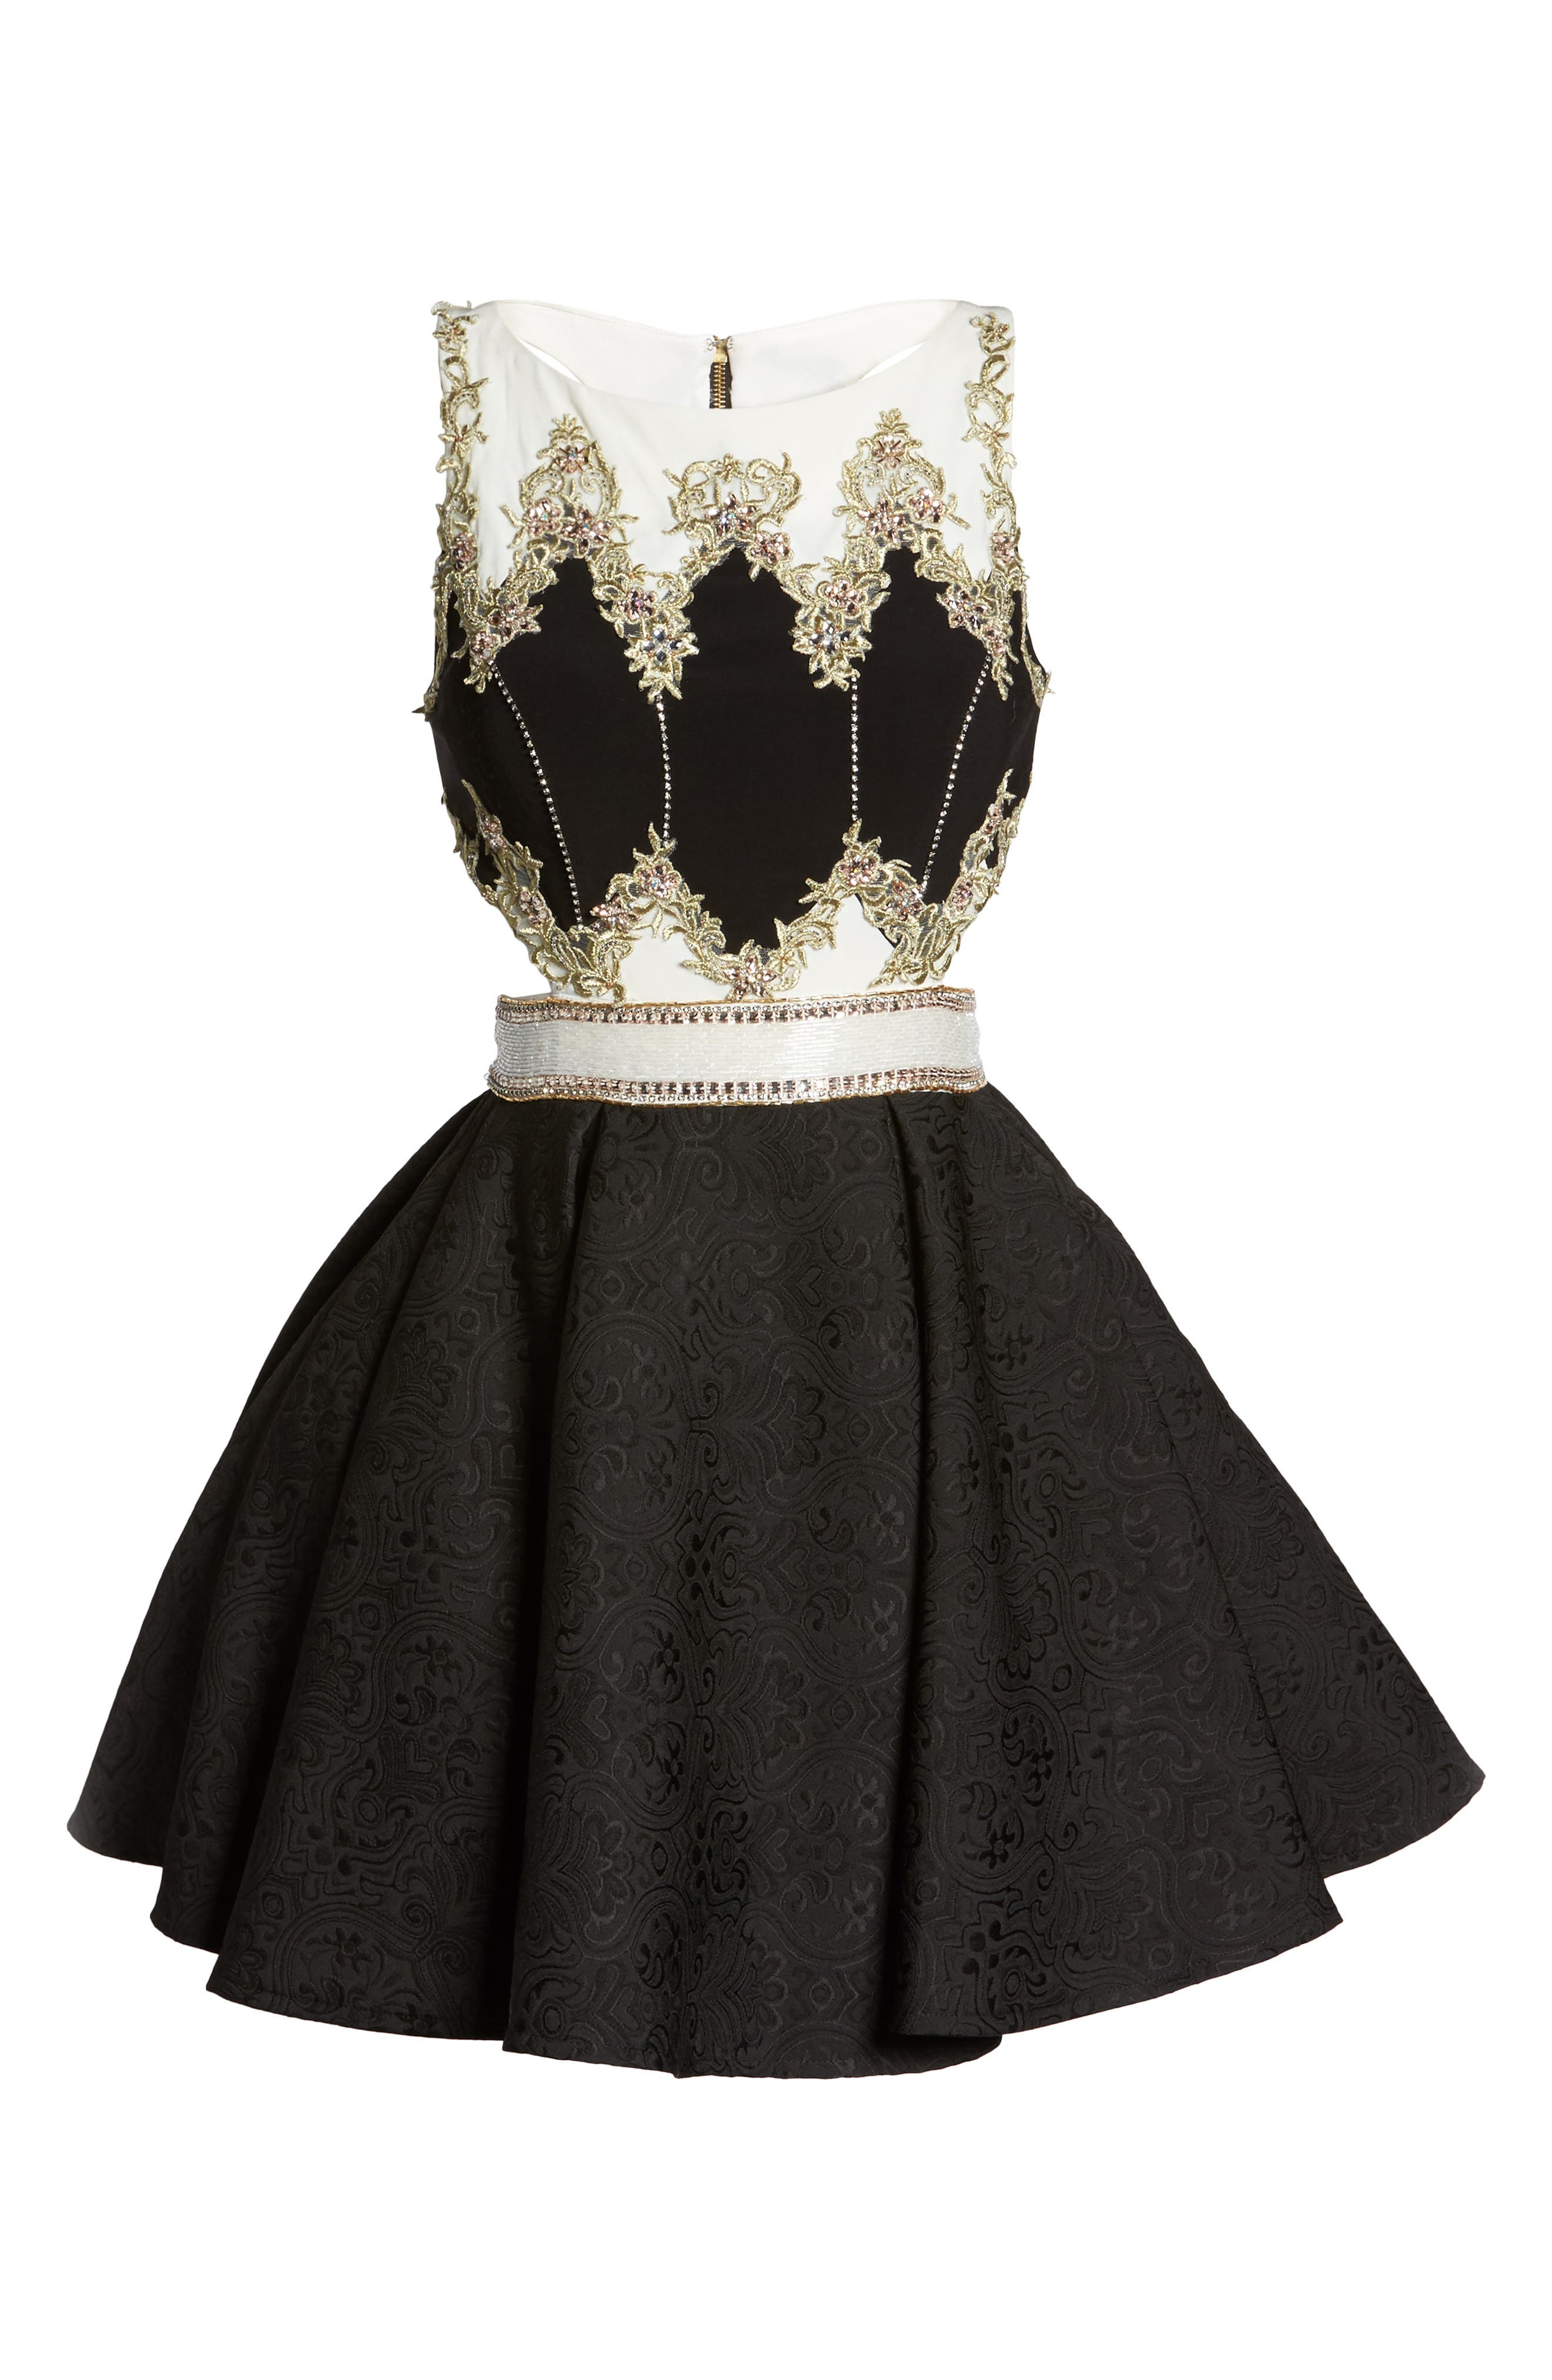 Embellished Cutout Back Cocktail Dress,                             Alternate thumbnail 6, color,                             Black Ivory